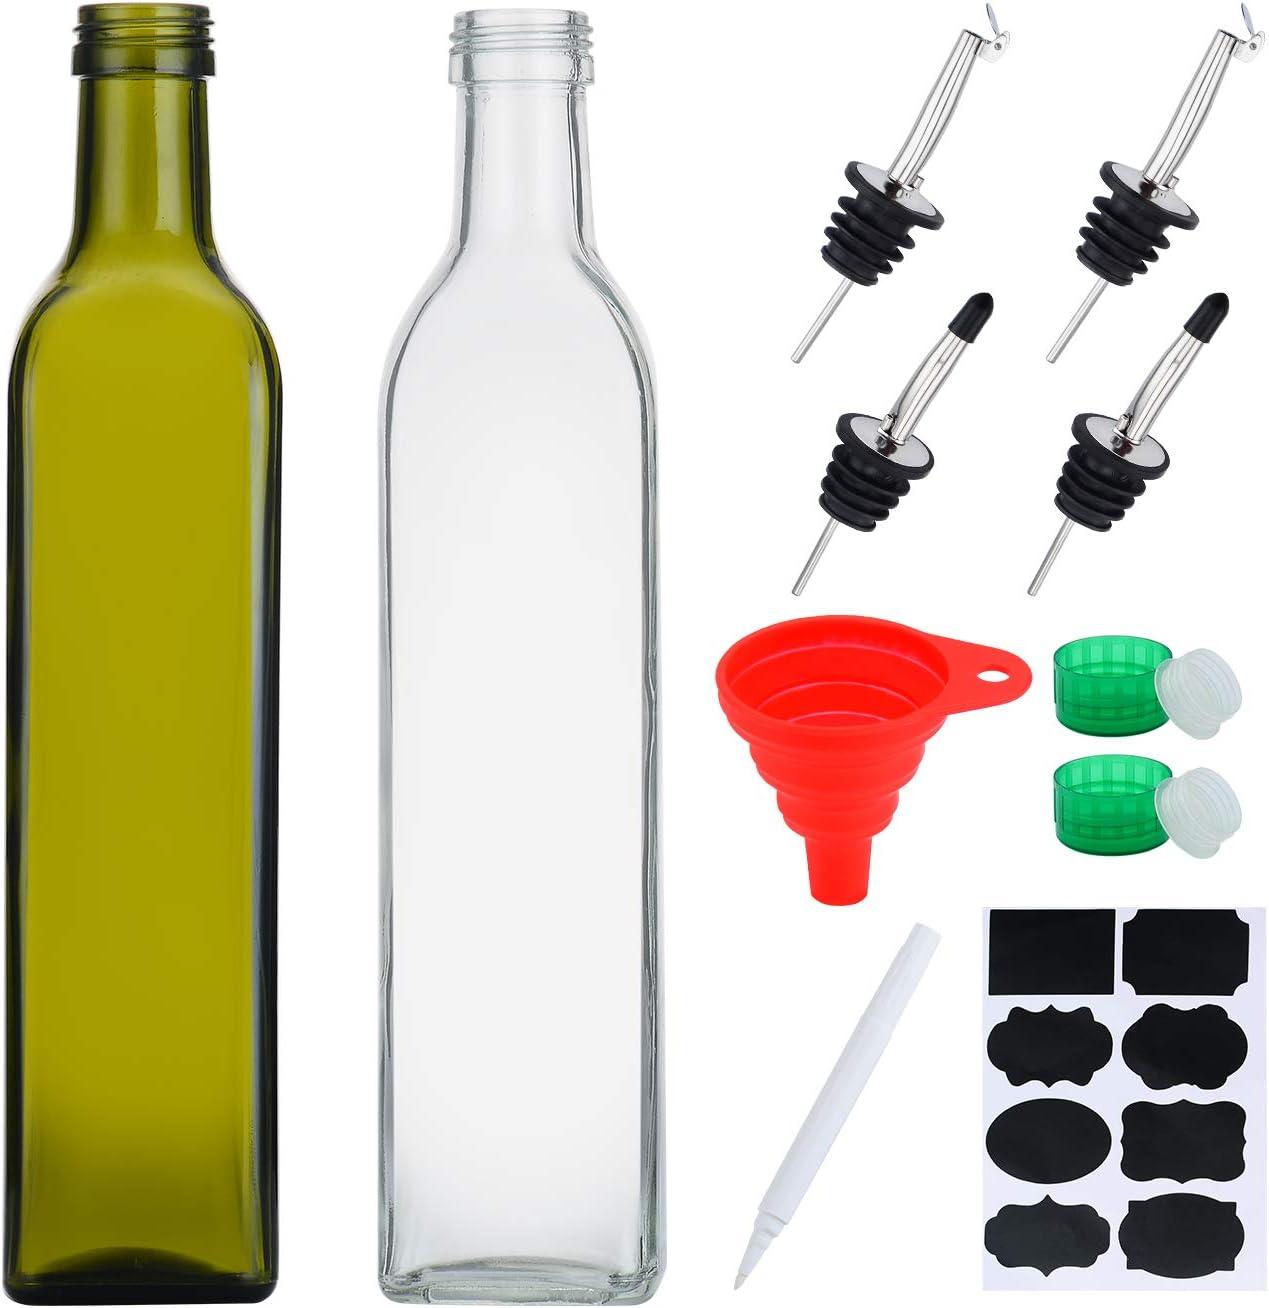 5oz Glass Olive Oil Bottle and Vinegar Cruet Sets, 5ml Oil Dispenser &  Vinegar Cruet with Pourers Spout and Funnel for Kitchen